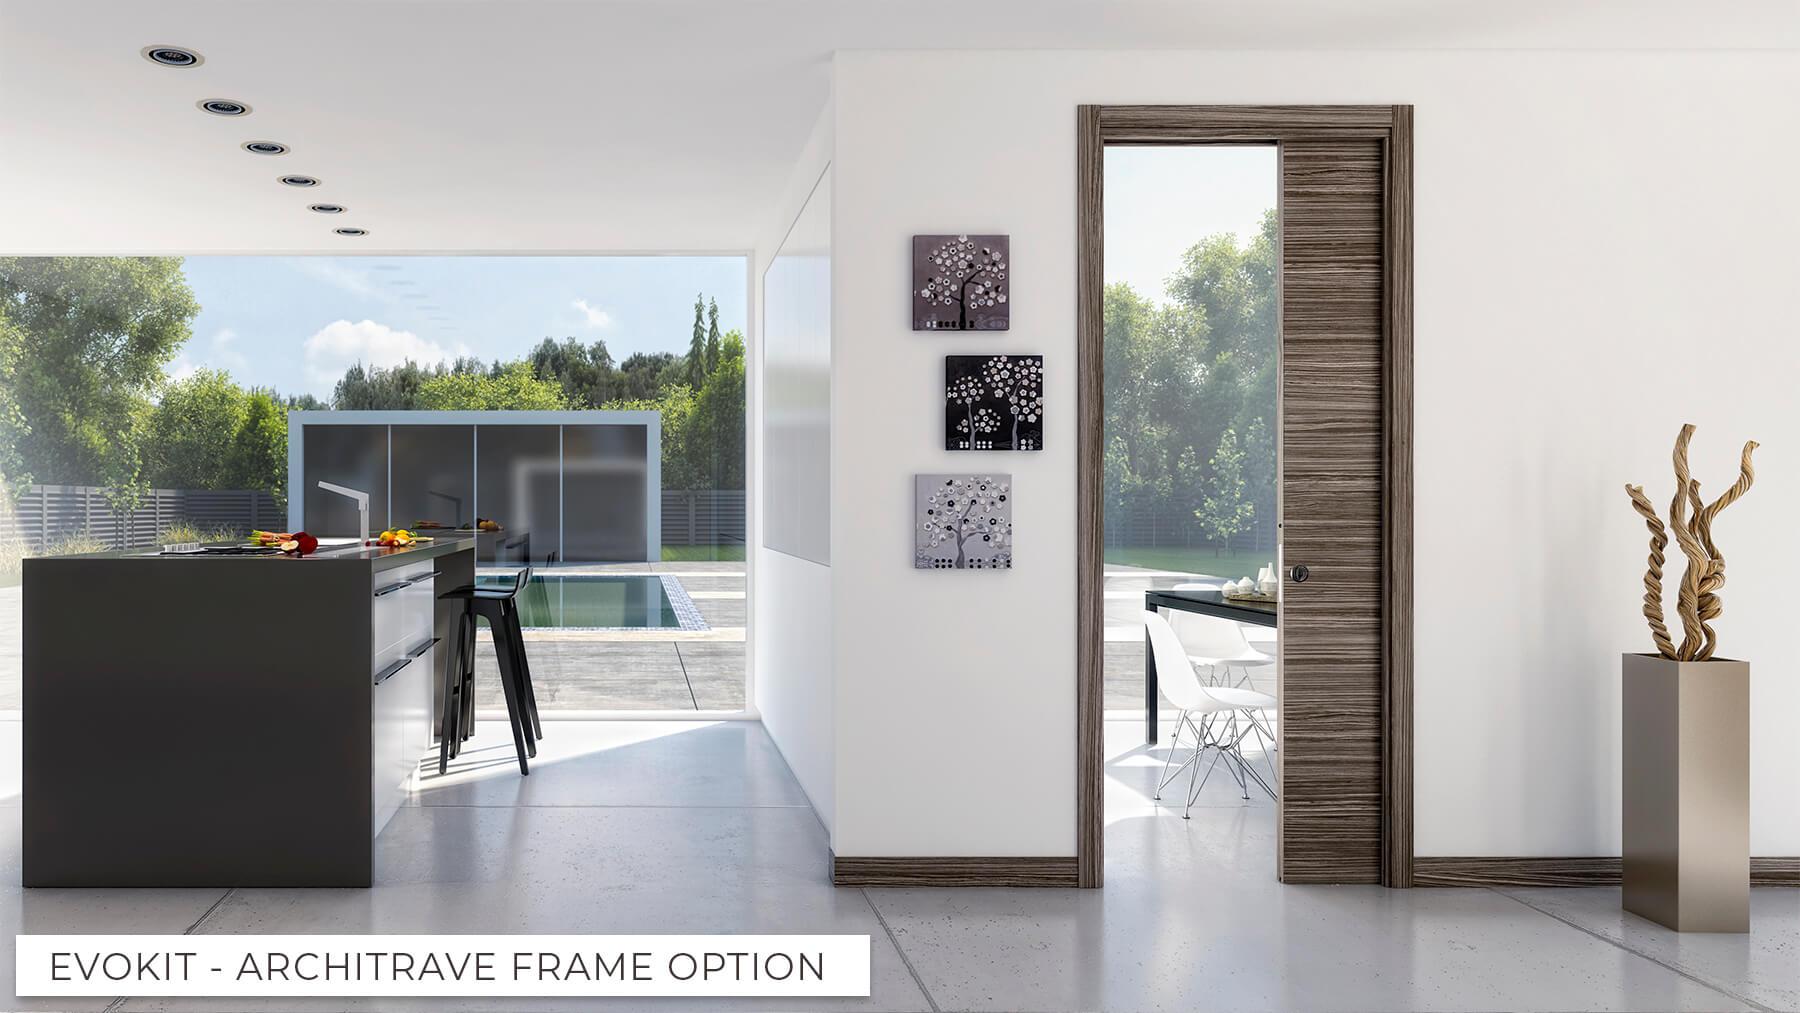 Evokit Architrave frame option